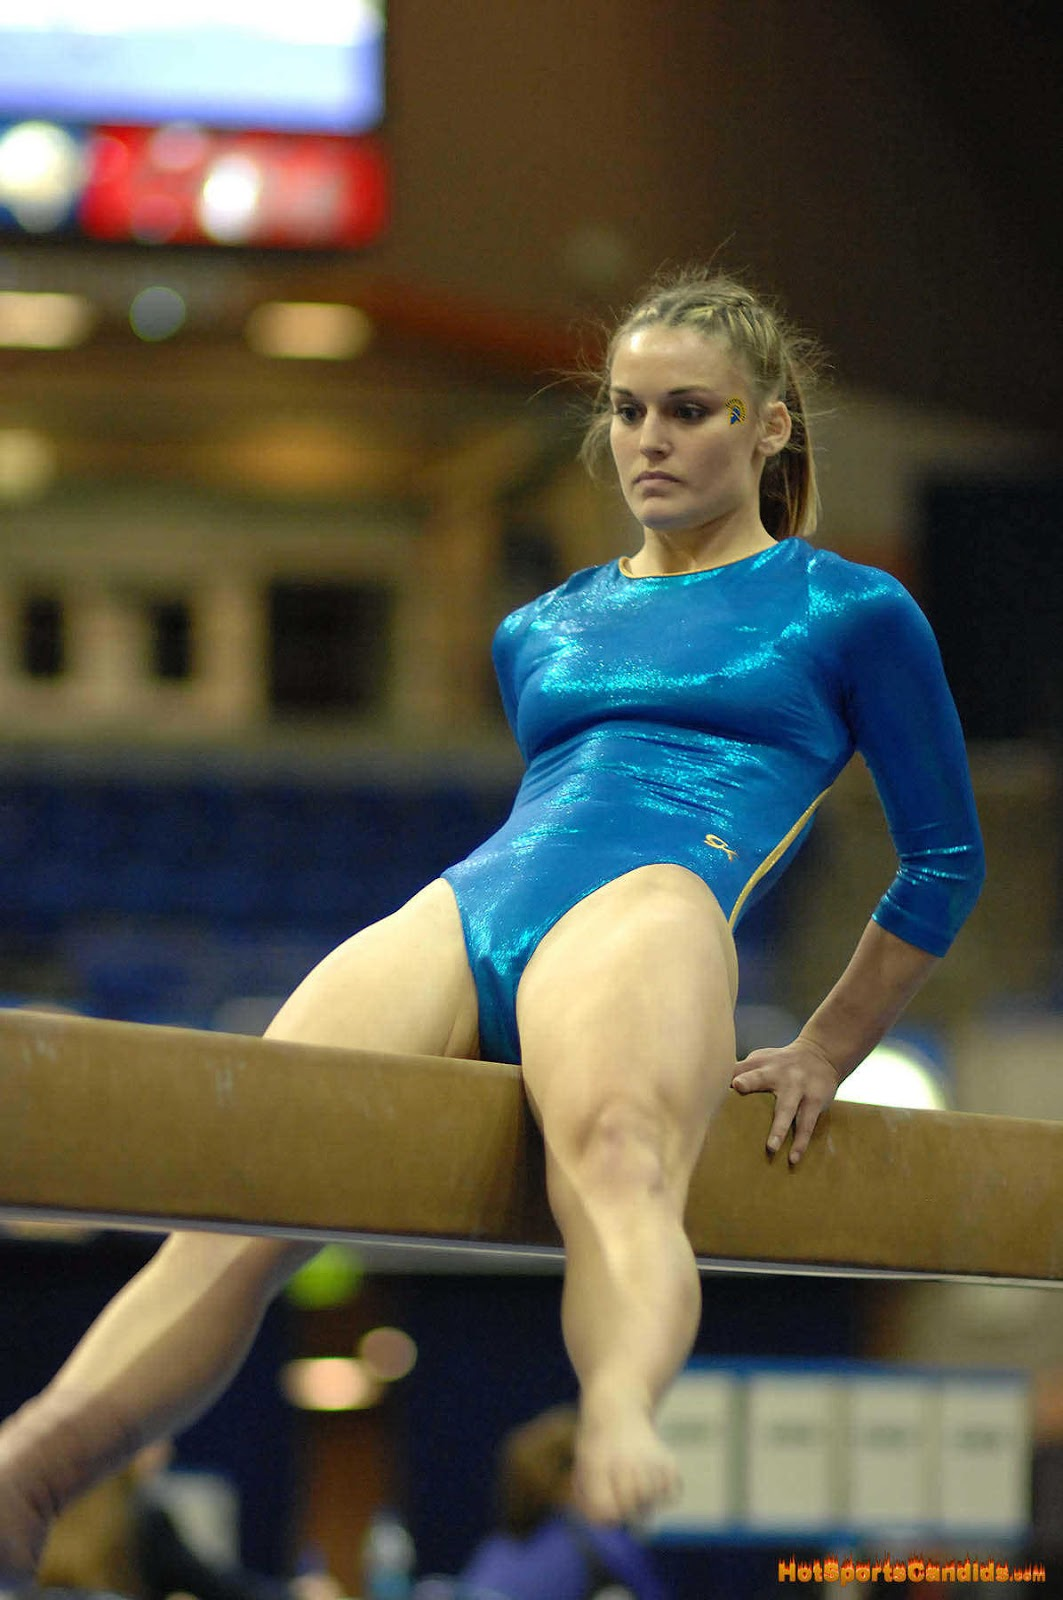 20 Camel Toe in Sports u will enjoy - photofun4ucom